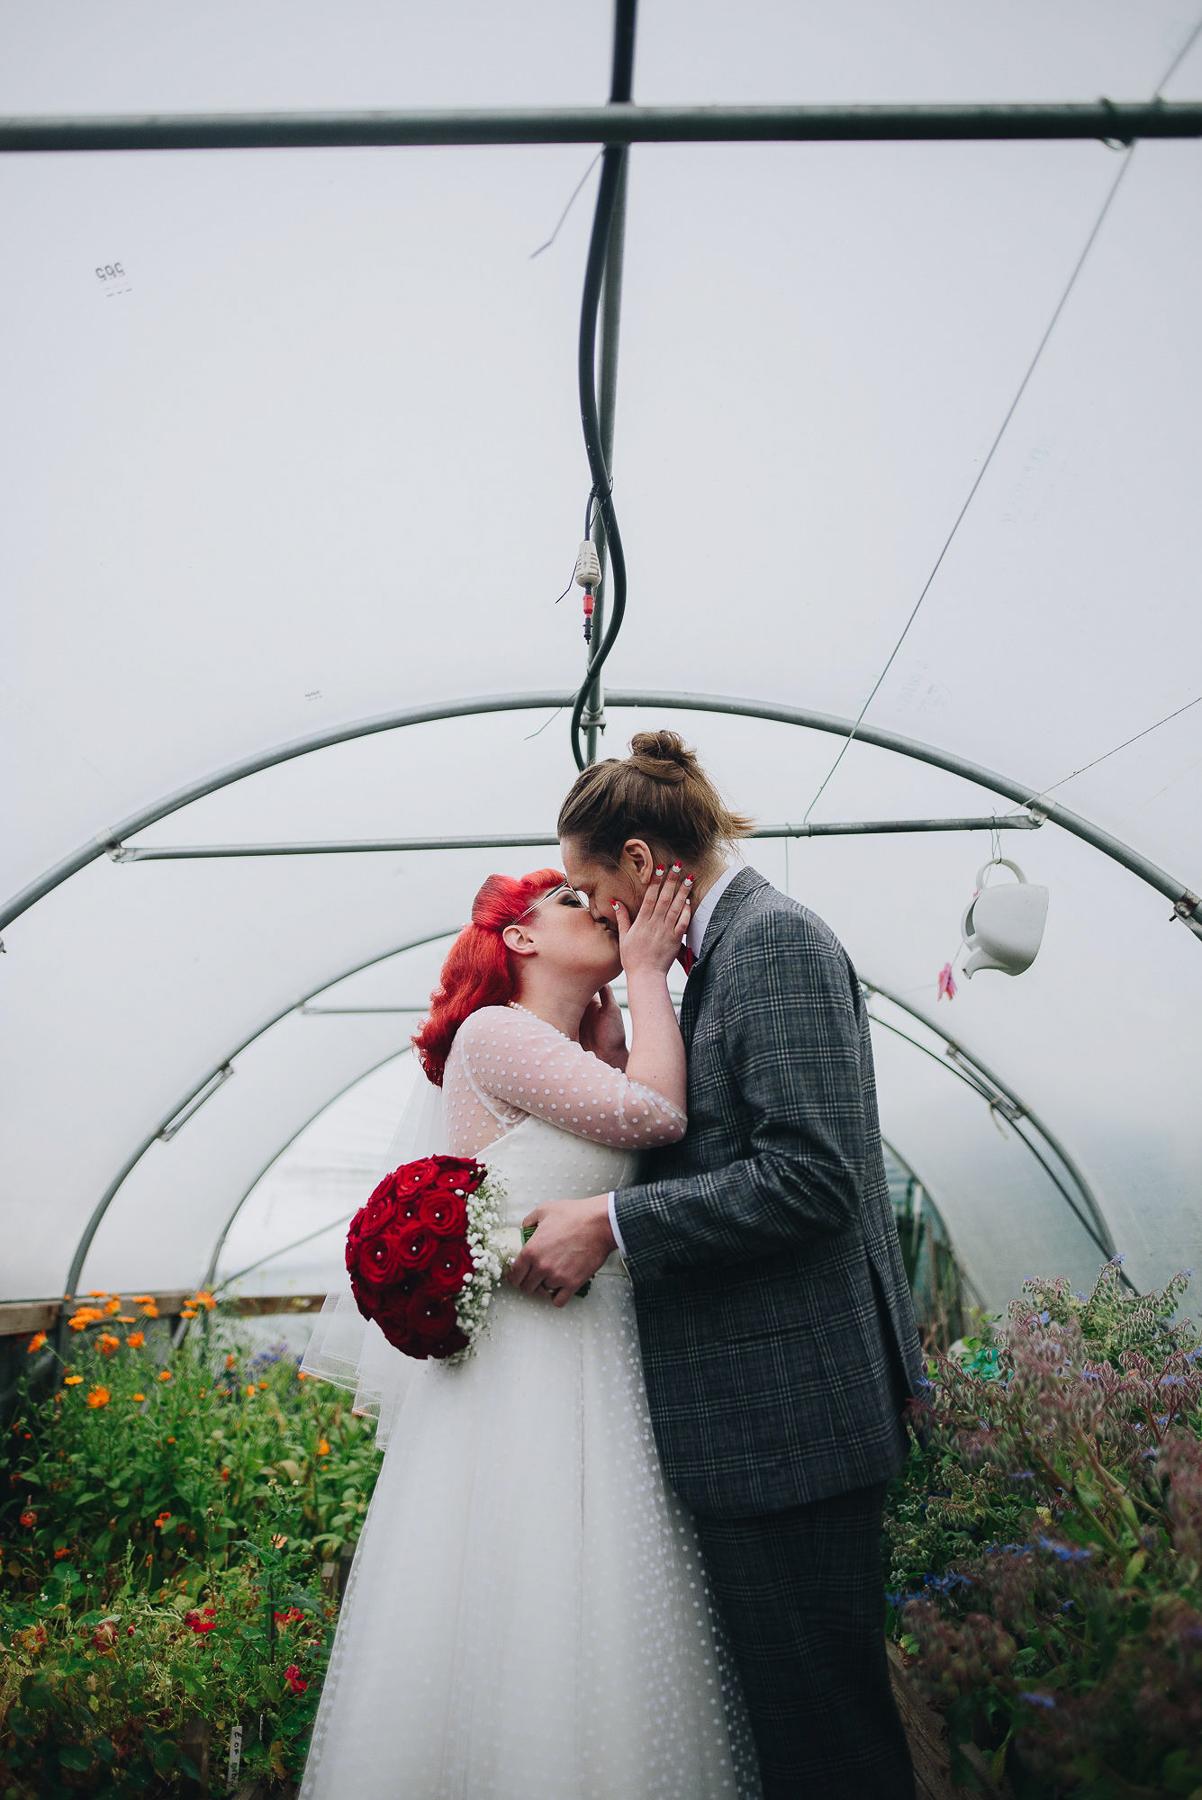 Wellbeing_Farm_Wedding_Photography_The_Pin-Up_Bride_Lara_Shaun-99.jpg